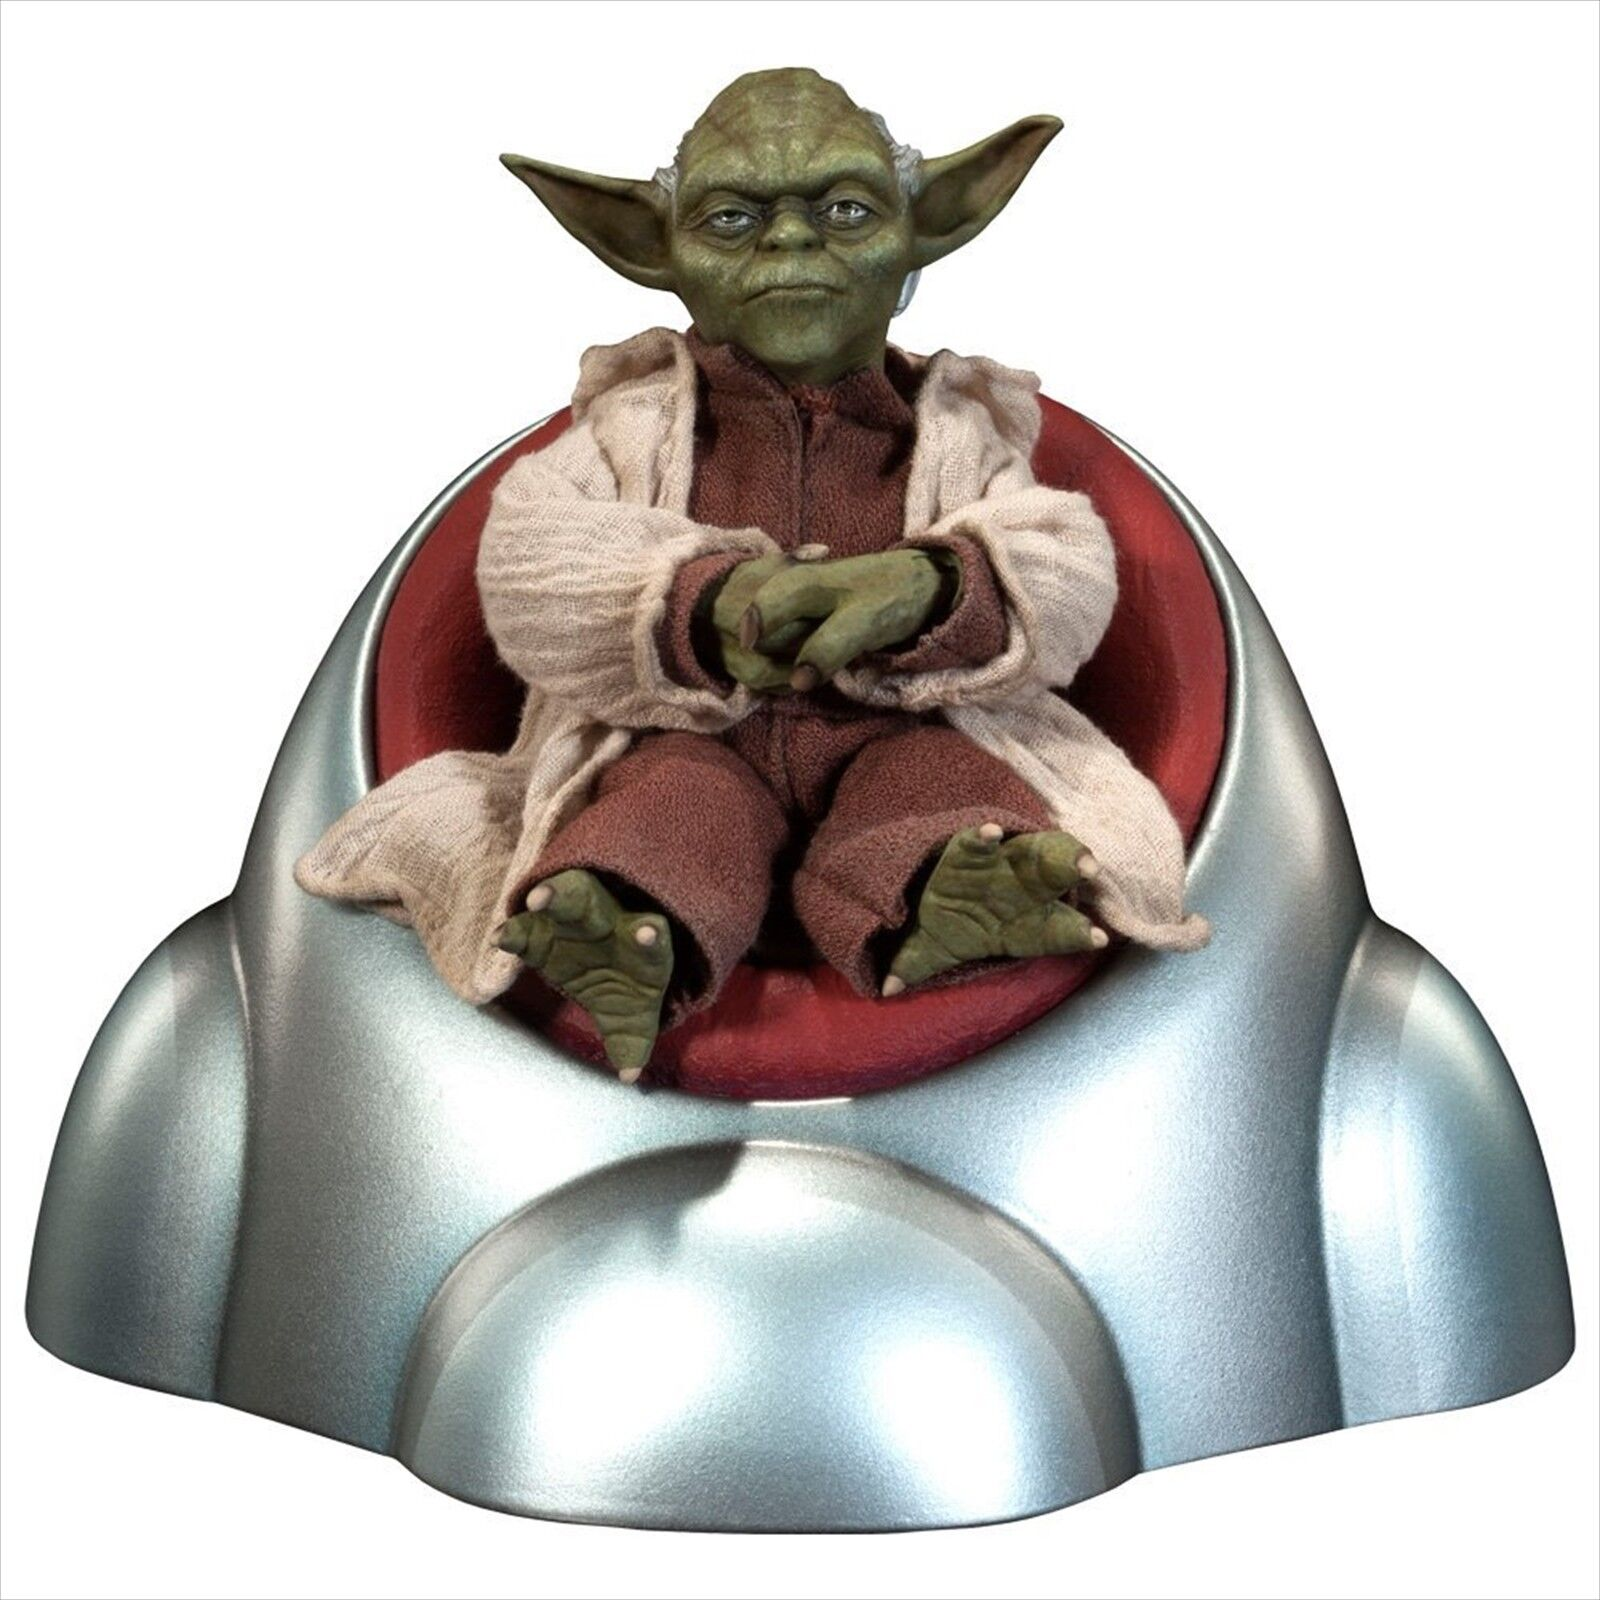 Sideshow Star Wars 1/6 Scale Figure Order of Jedi Yoda Jedi Master